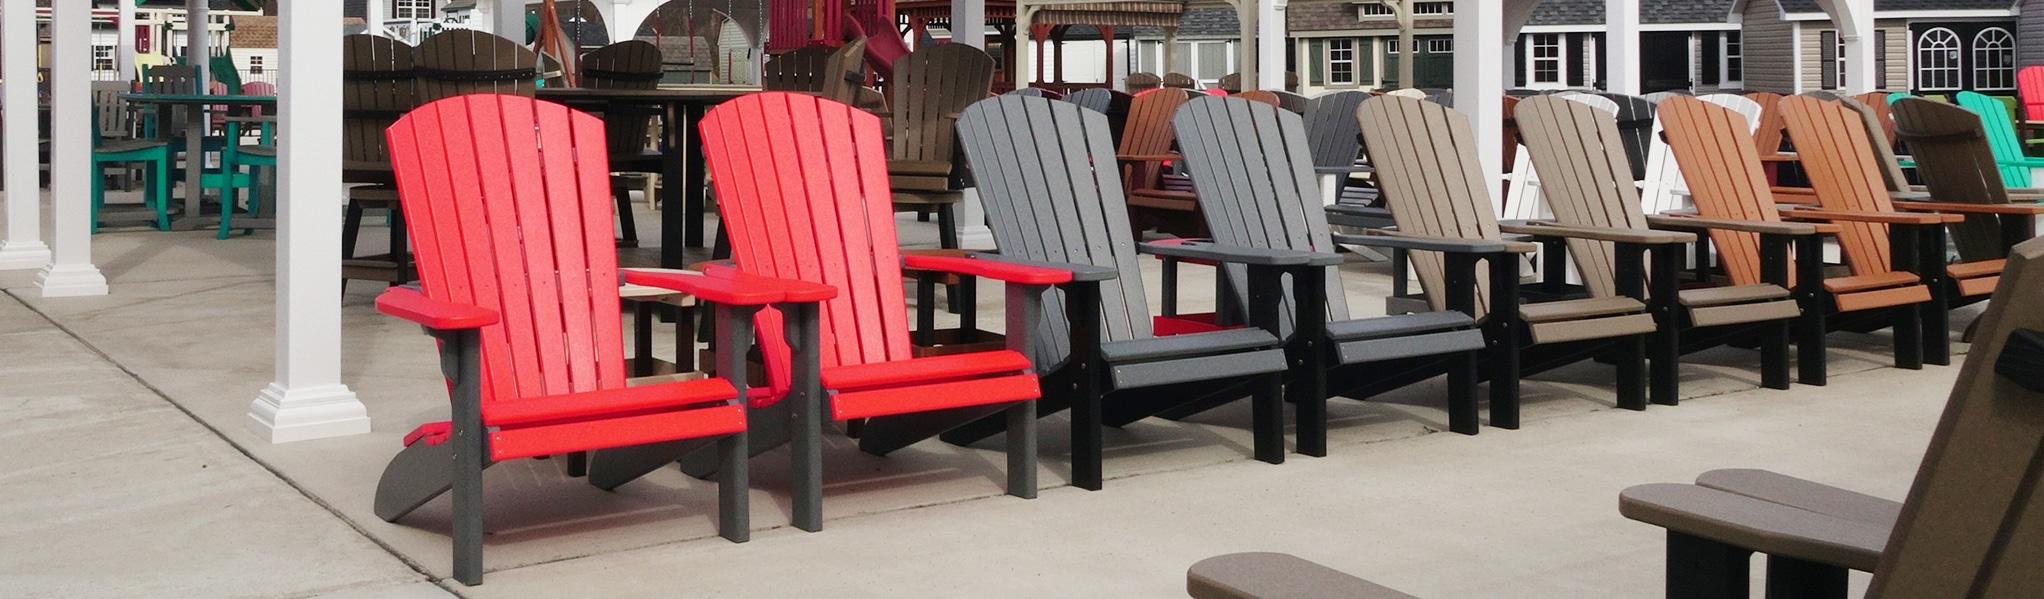 outdoor furniture amish depot